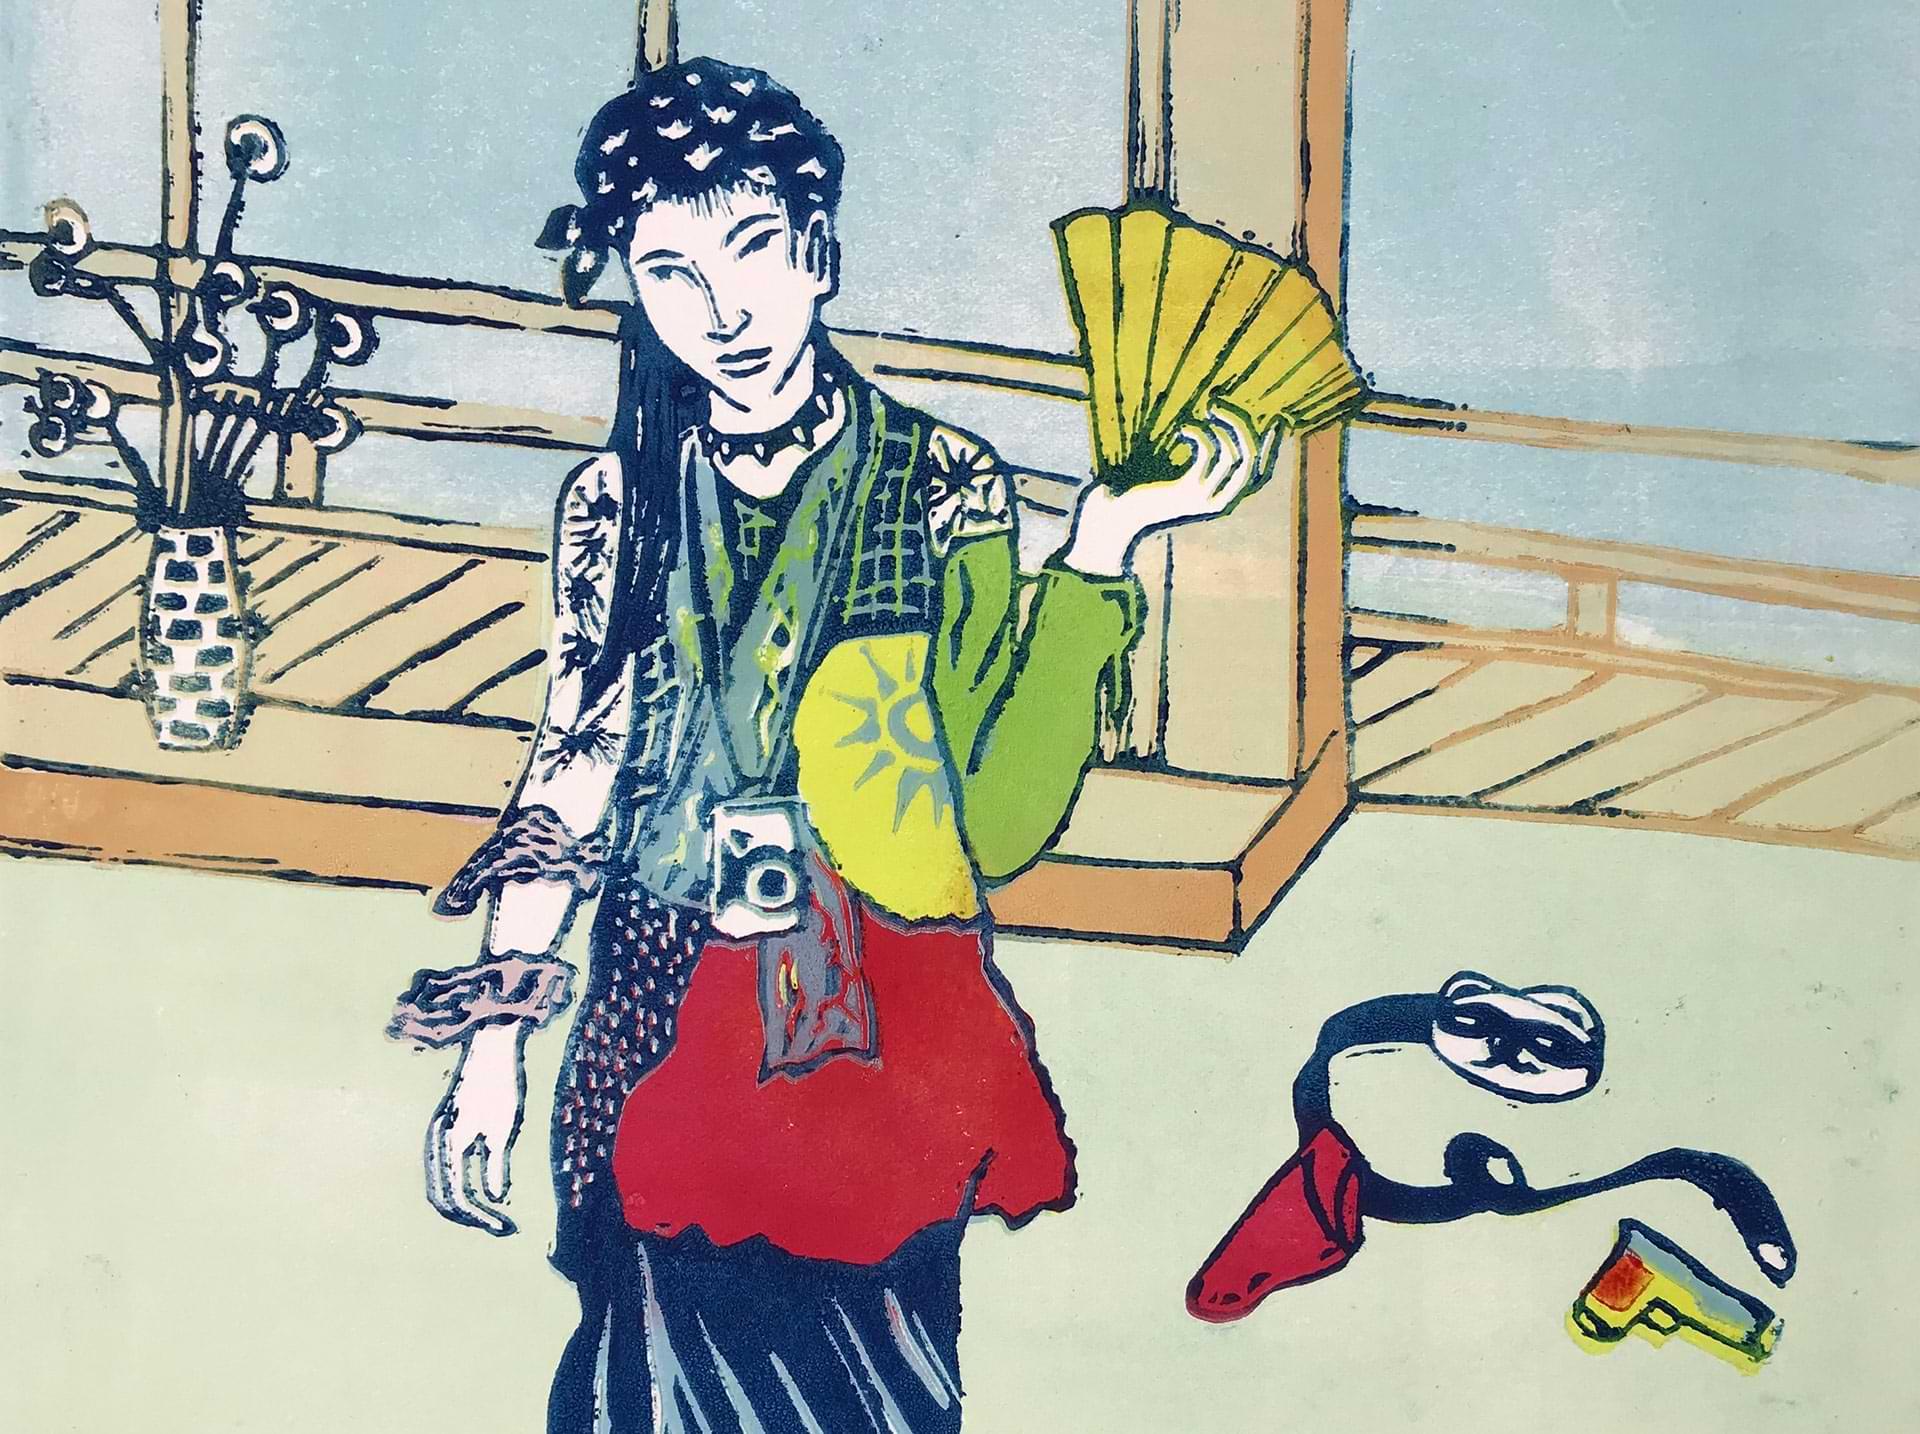 christianehaag-guerillageishas-japan-japaneseart-kunst-art-linoldruck-linoprint